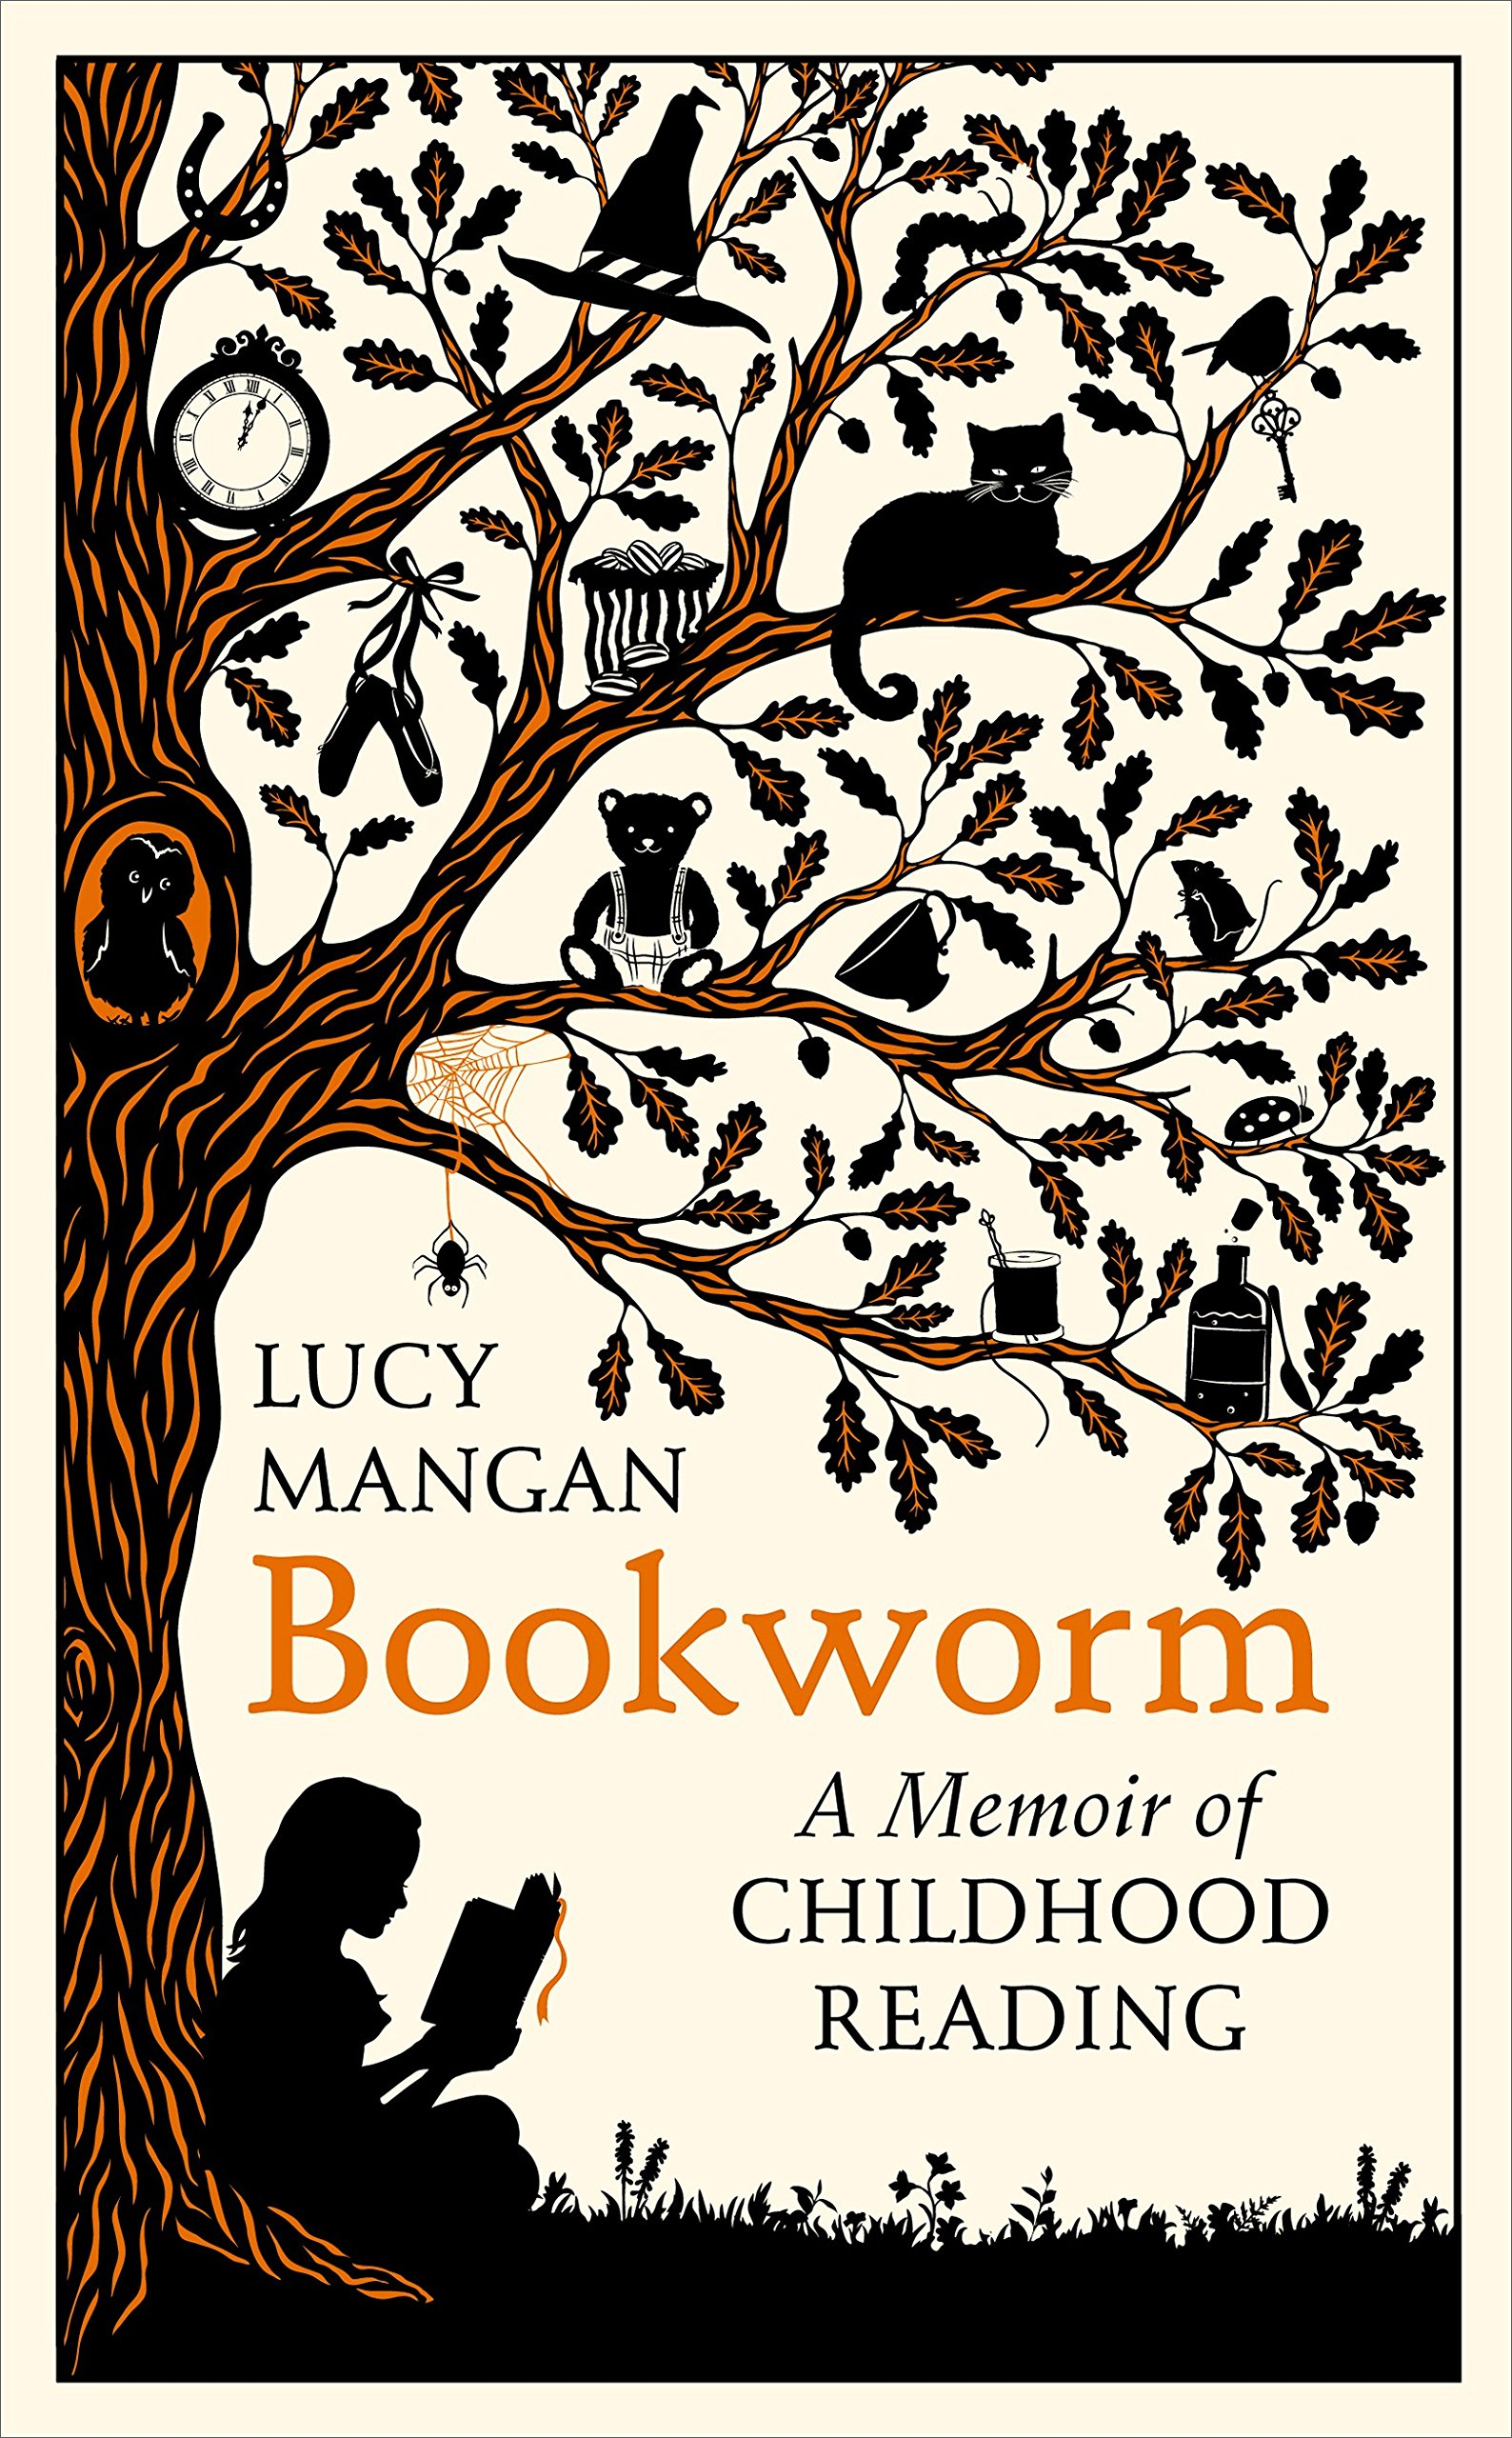 Image result for bookworm a memoir of childhood reading